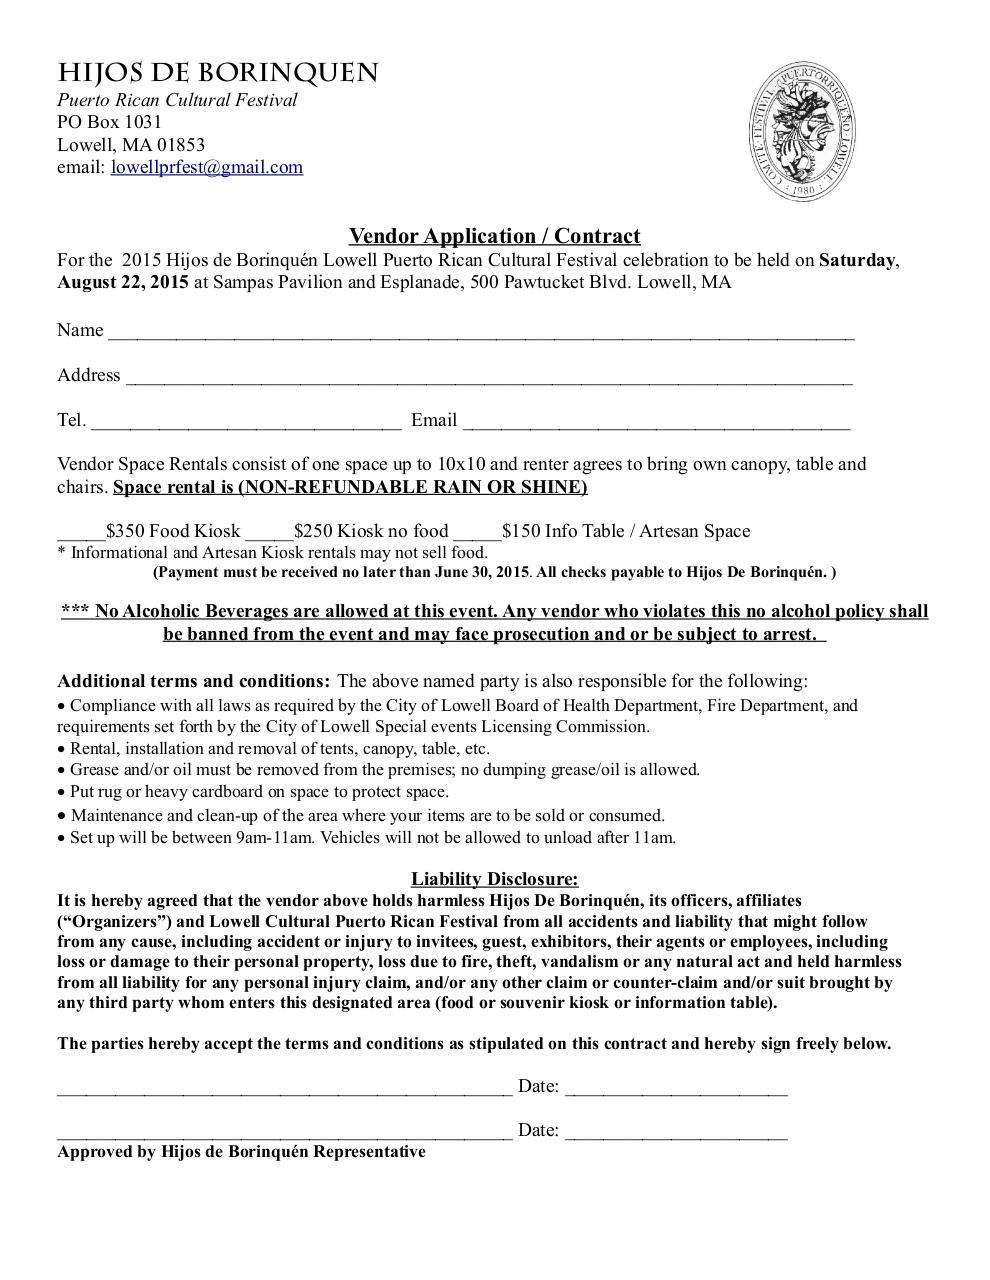 Vendor Contract By Jeffrey Hernandez PDF Archive